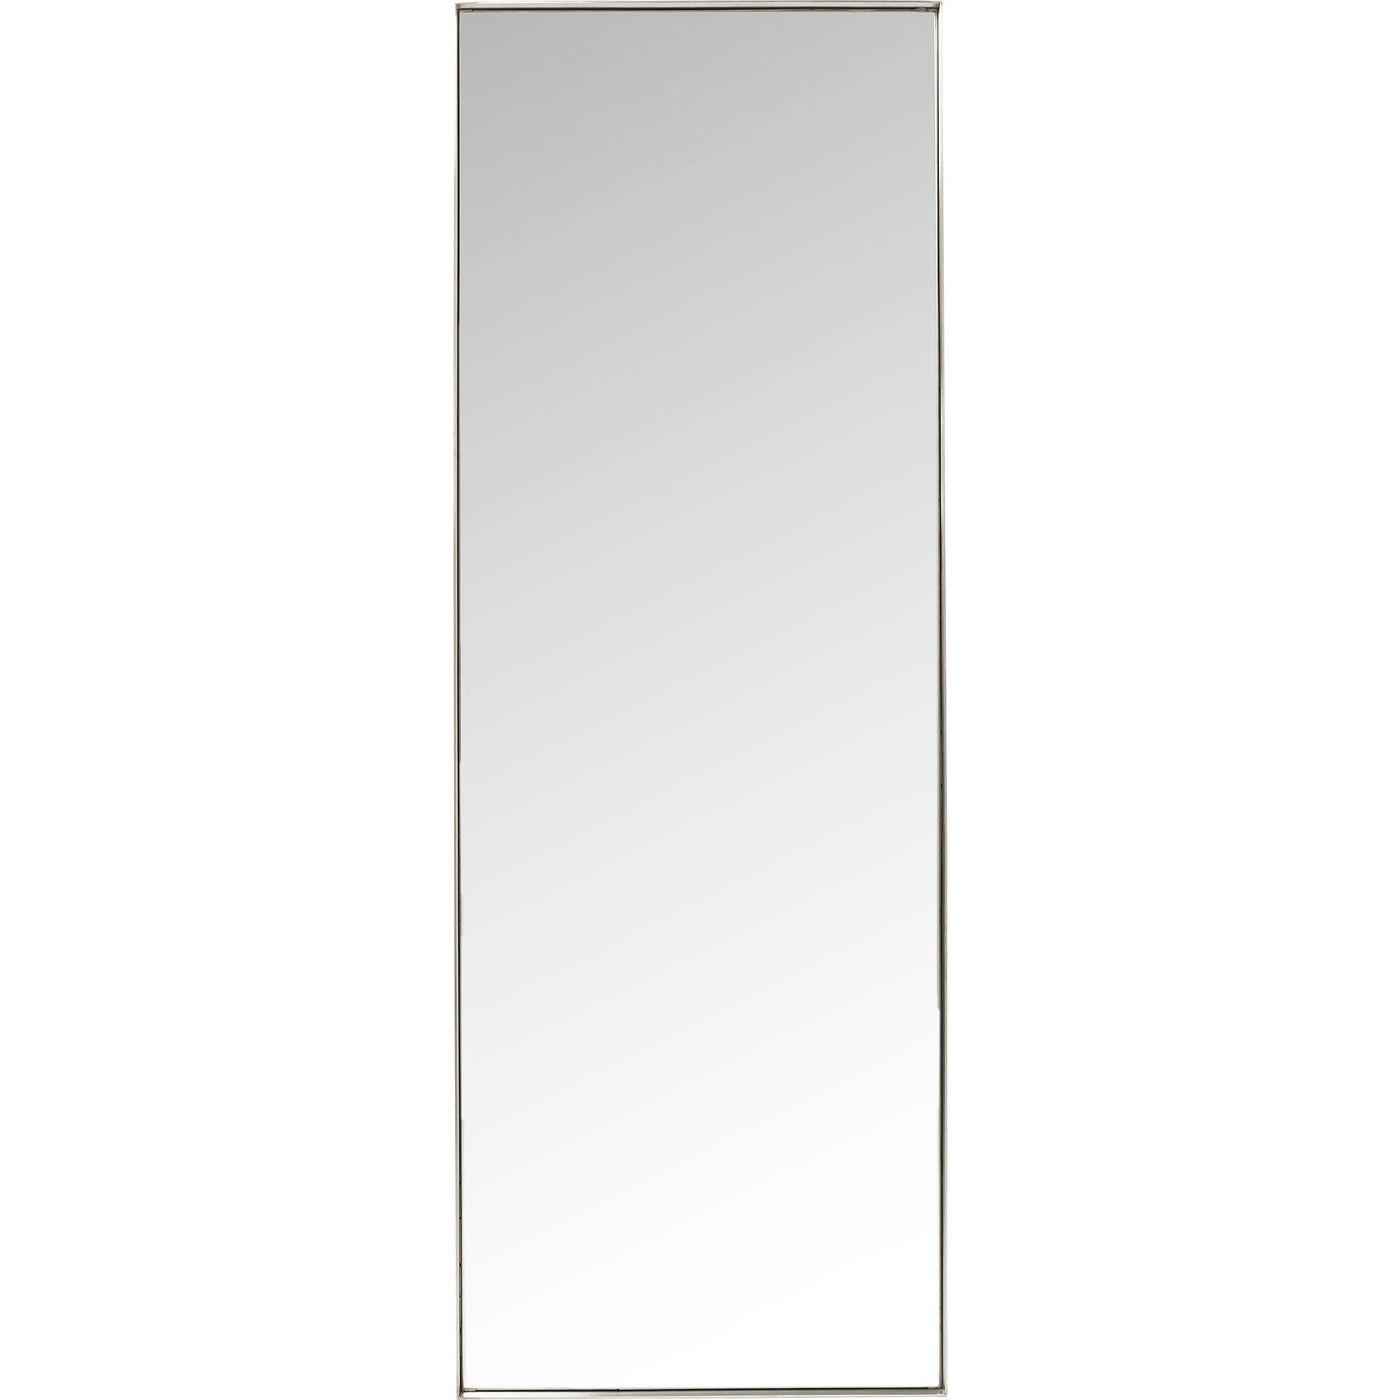 Spejl Curve Rektangulær Rustfrit Stål 200 x 70 cm